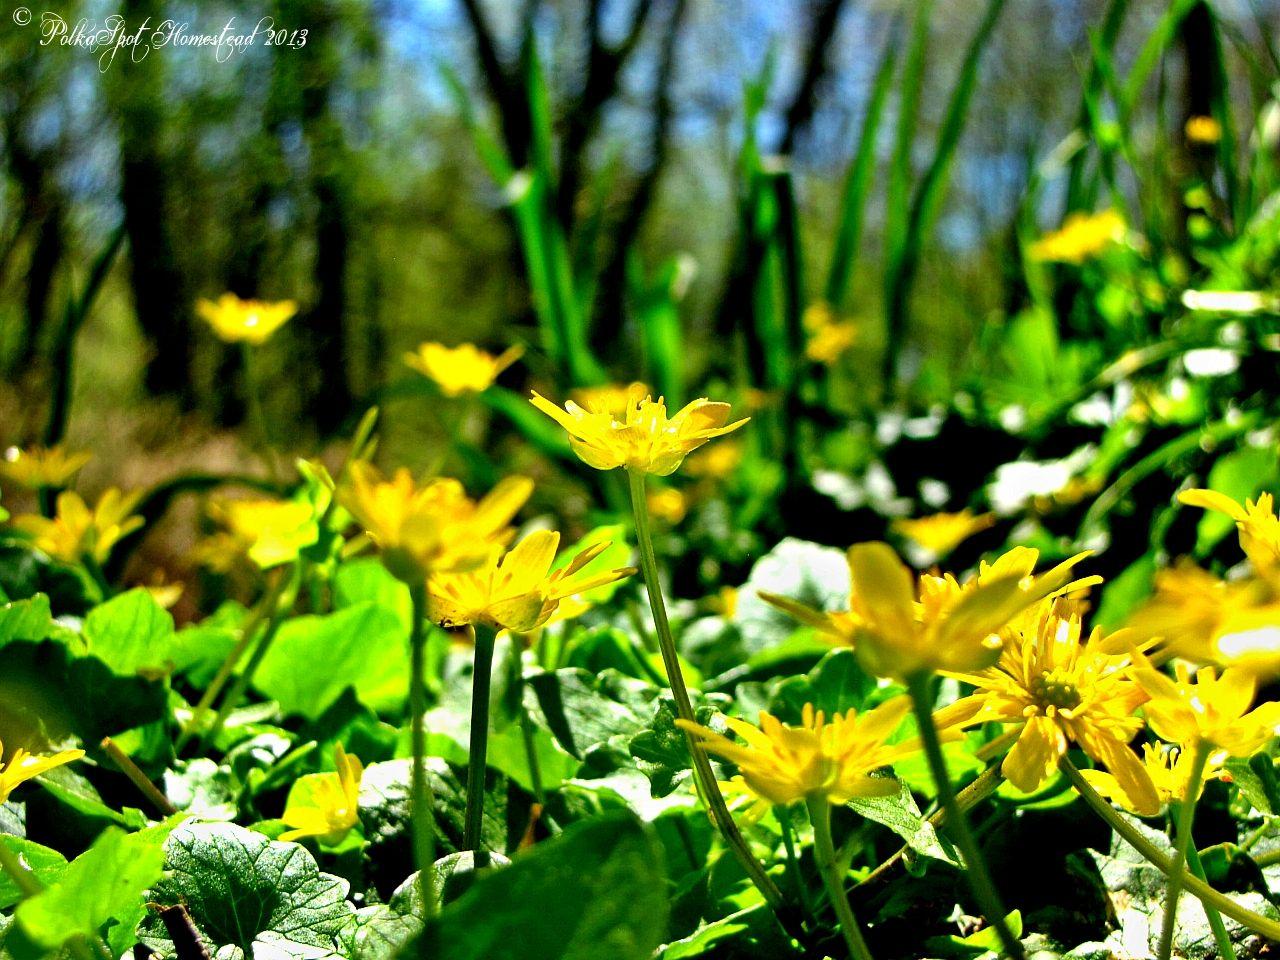 Native flower patch. PolkaSpot Homestead. 2013.